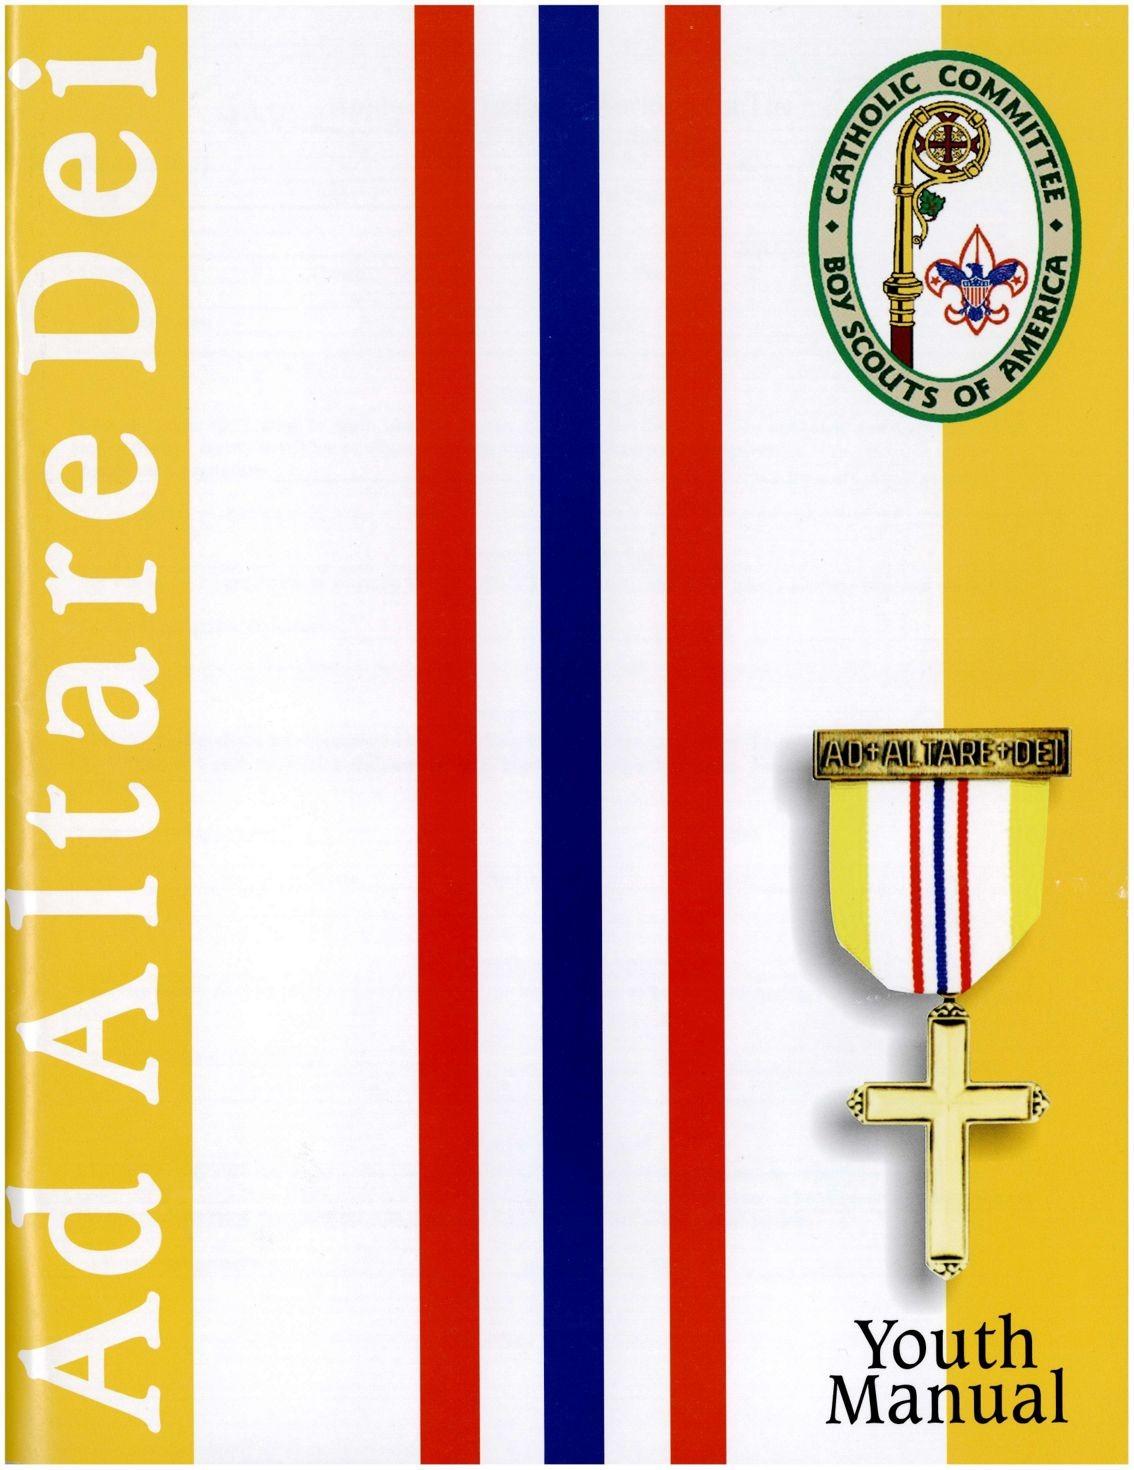 Ad Altare Dei Youth Manual Boy Scouts Of America